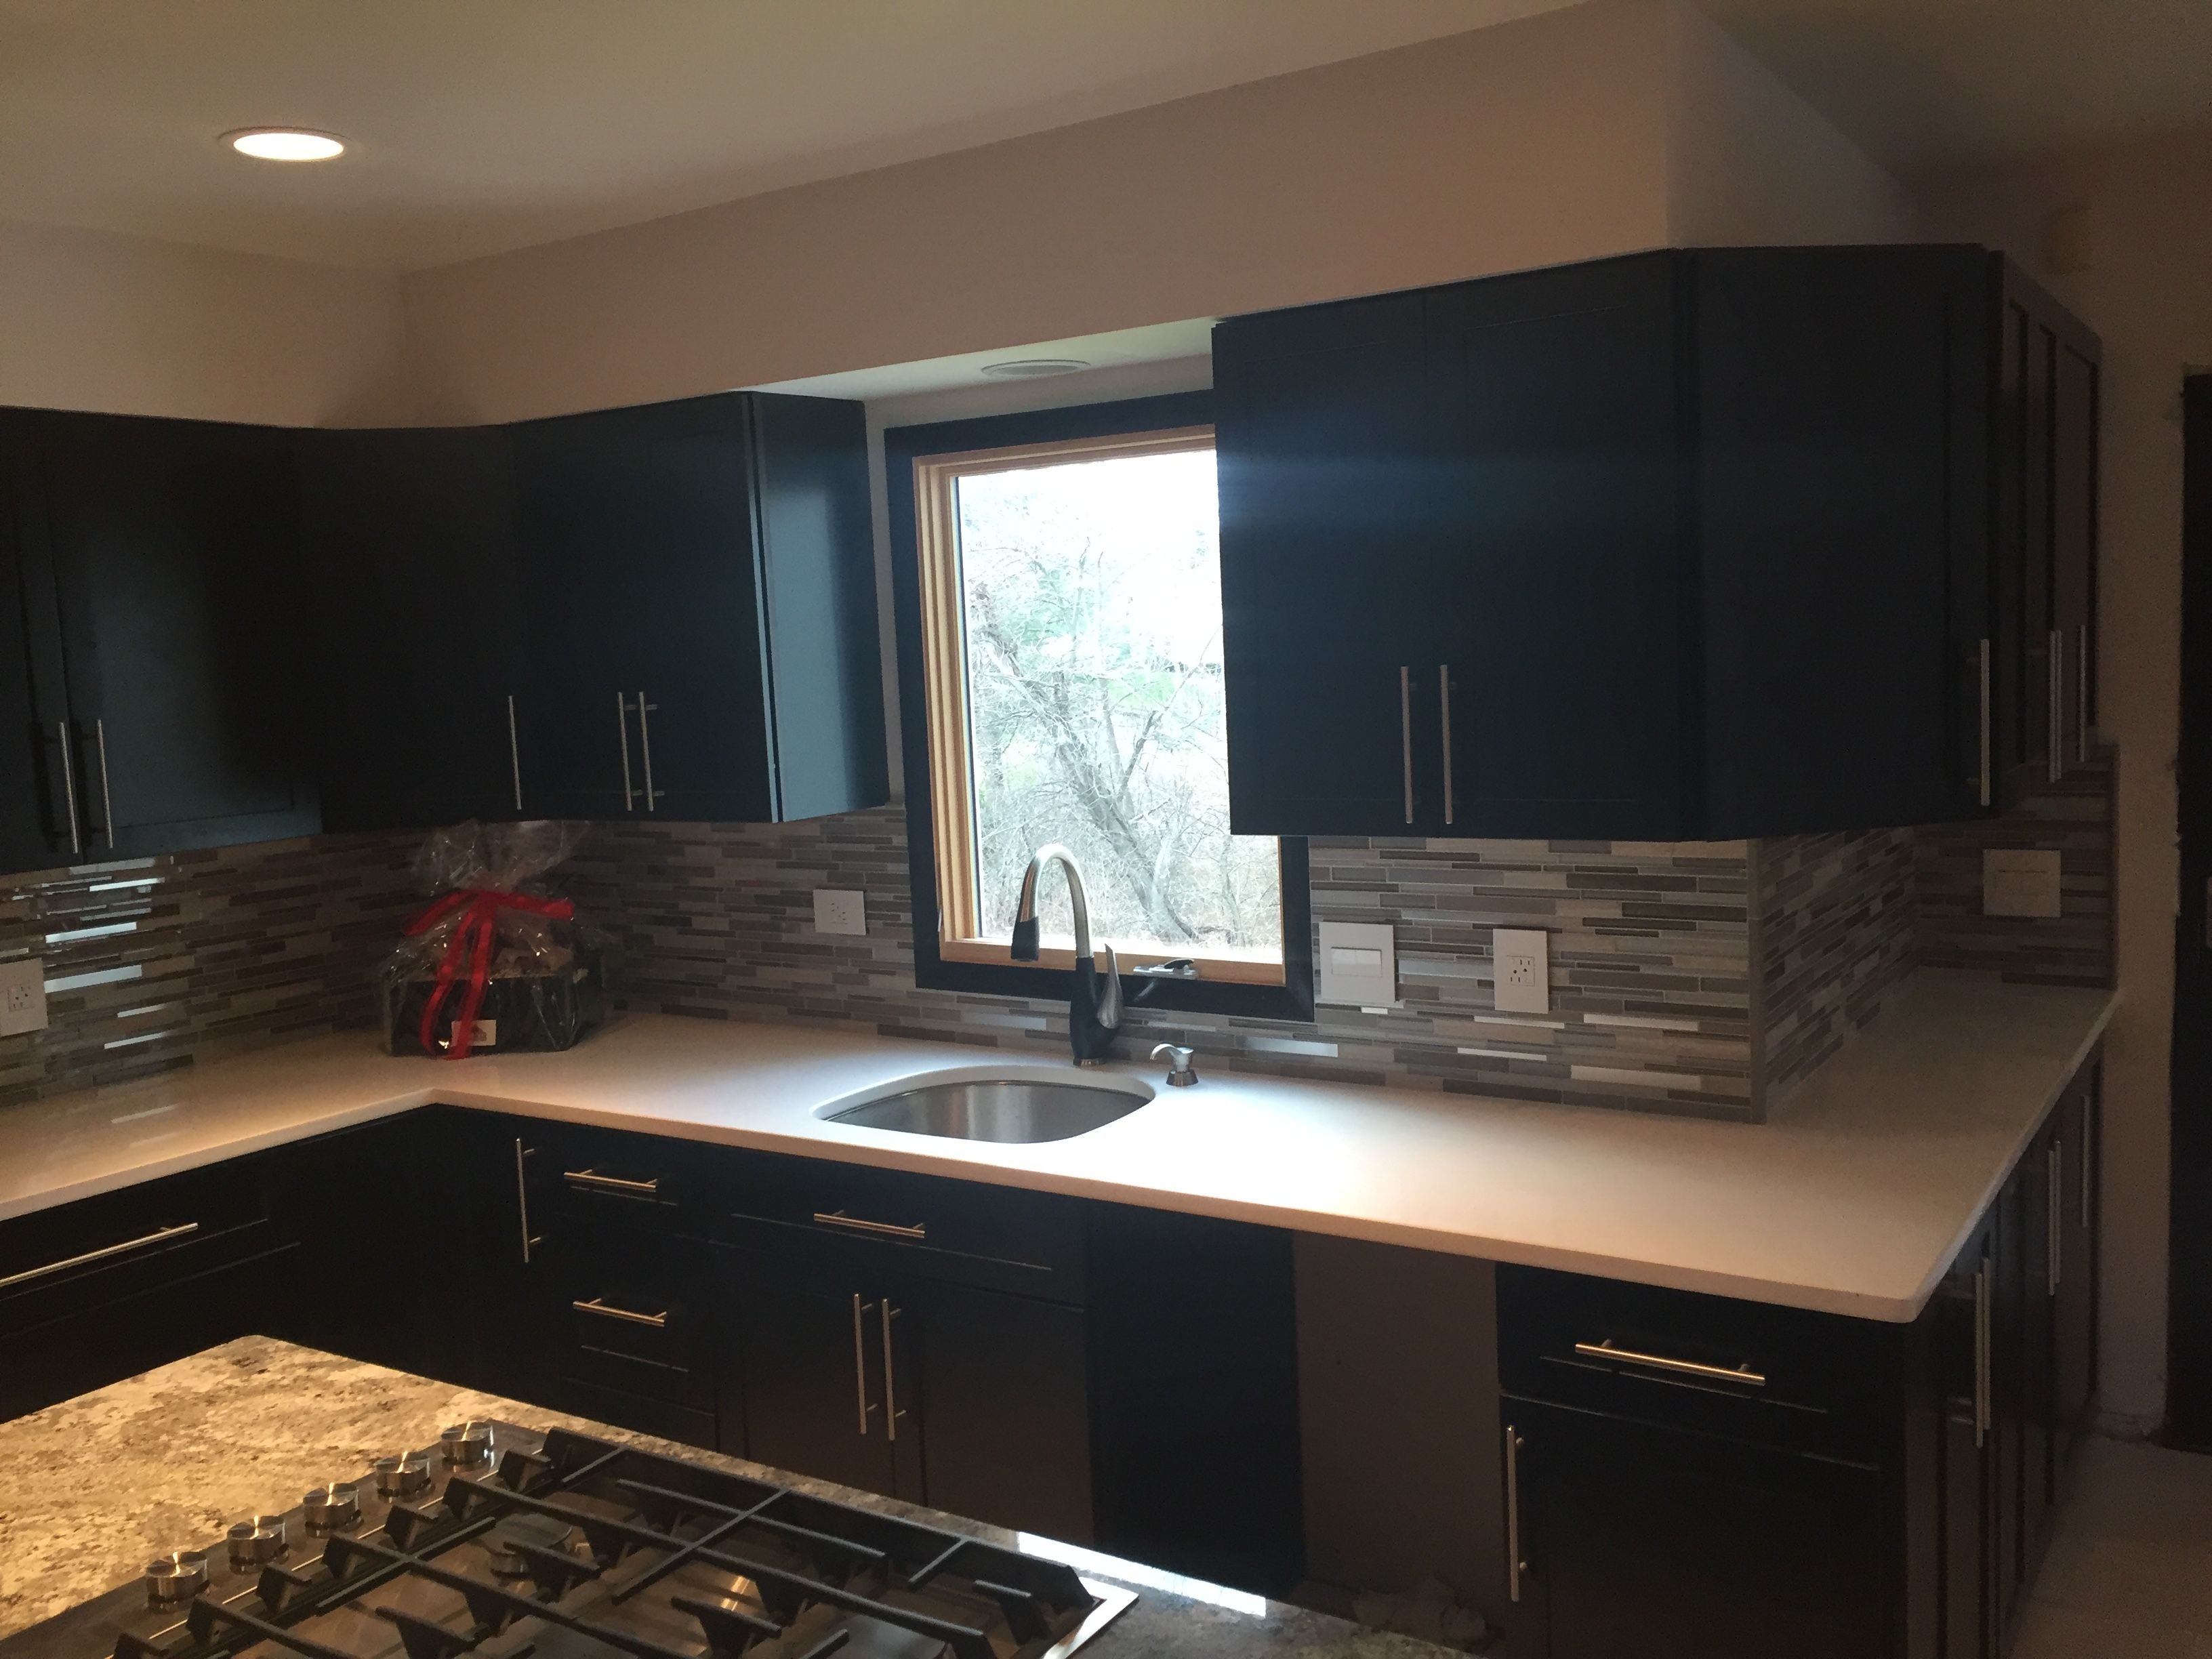 We Installed Ebony Kitchen Cabinets With Gl Mosaic Tile Backsplash Under Mount Sink Quartz